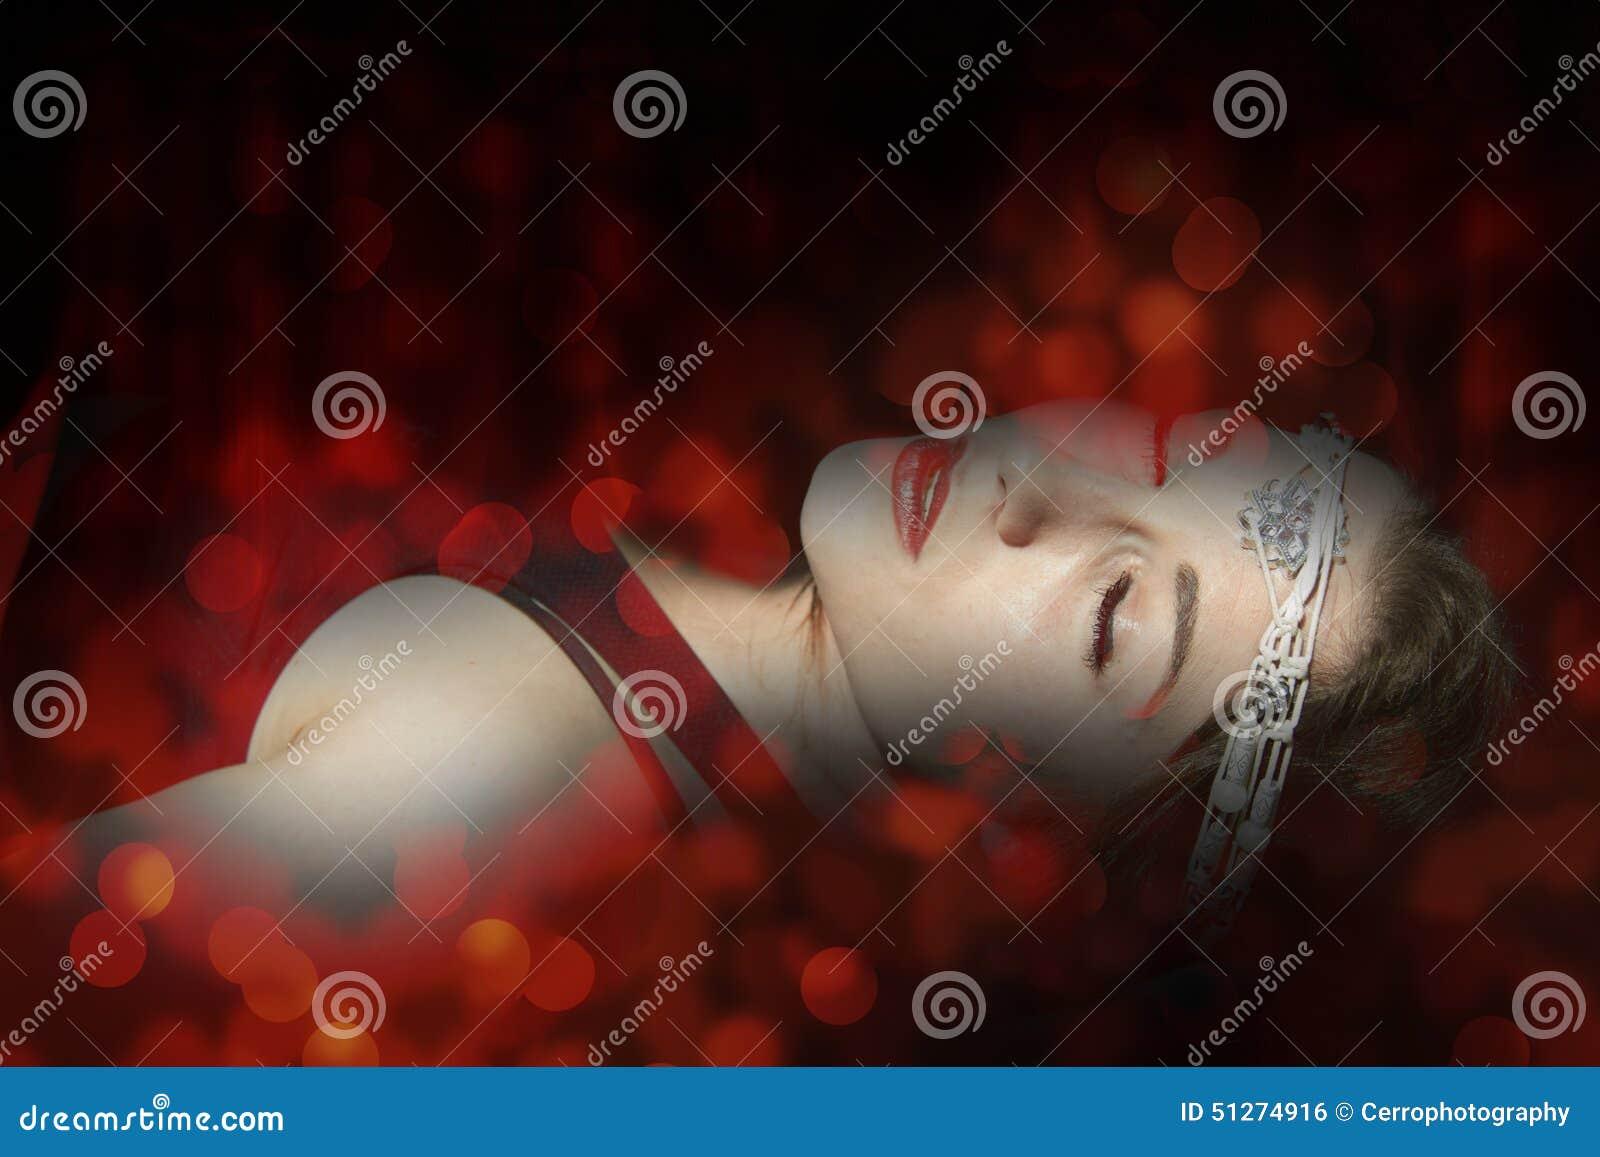 Woman death fantasy